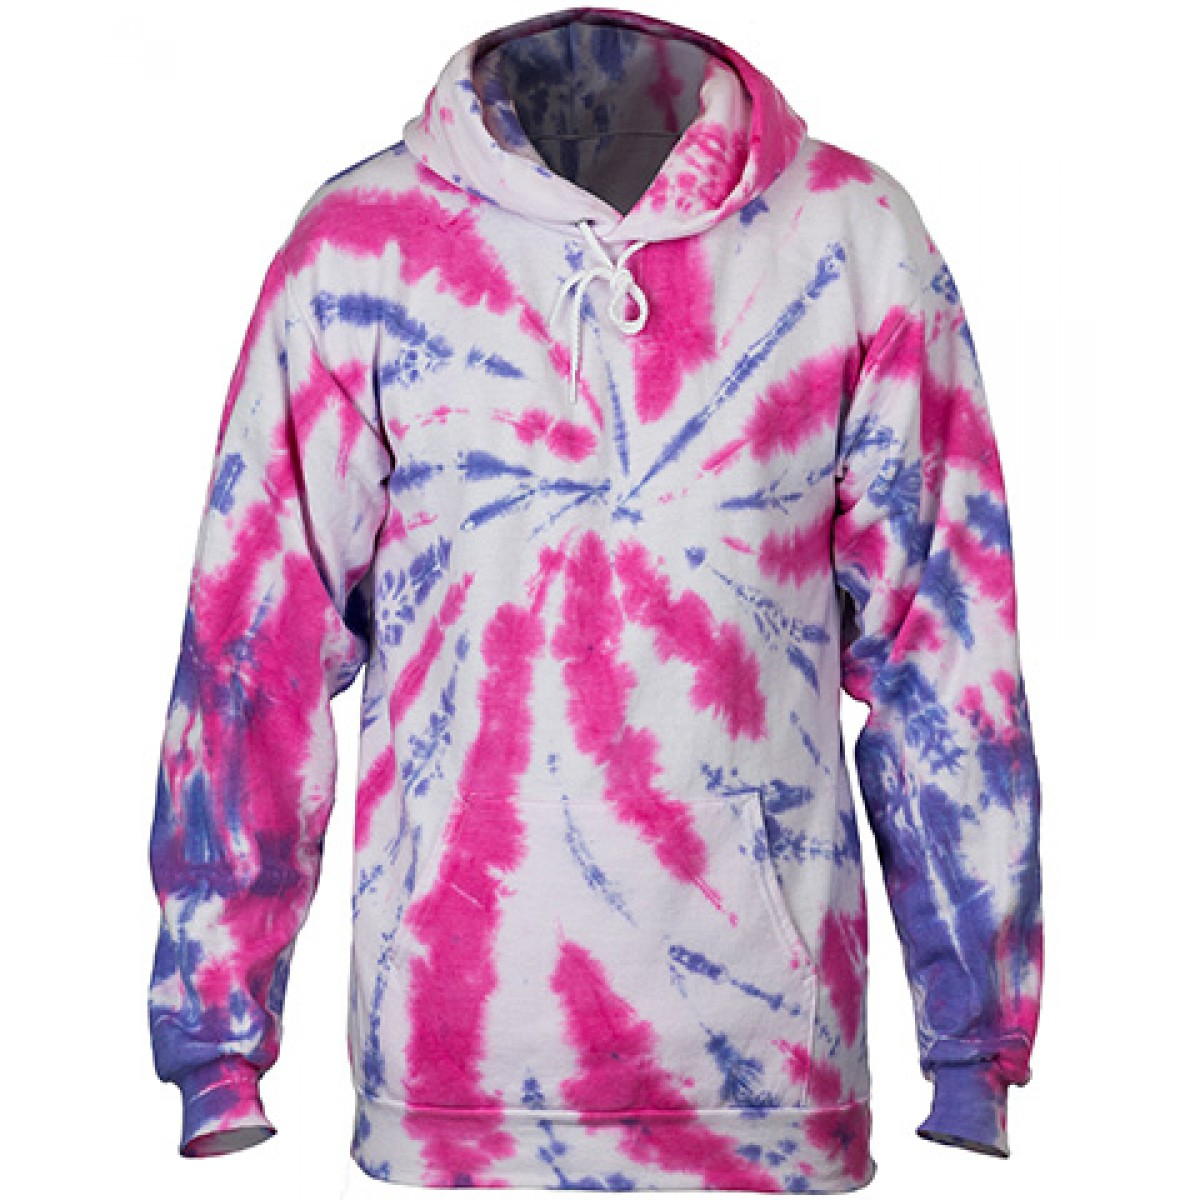 Tie-Dye Pullover Hooded Sweatshirt-Pink-L